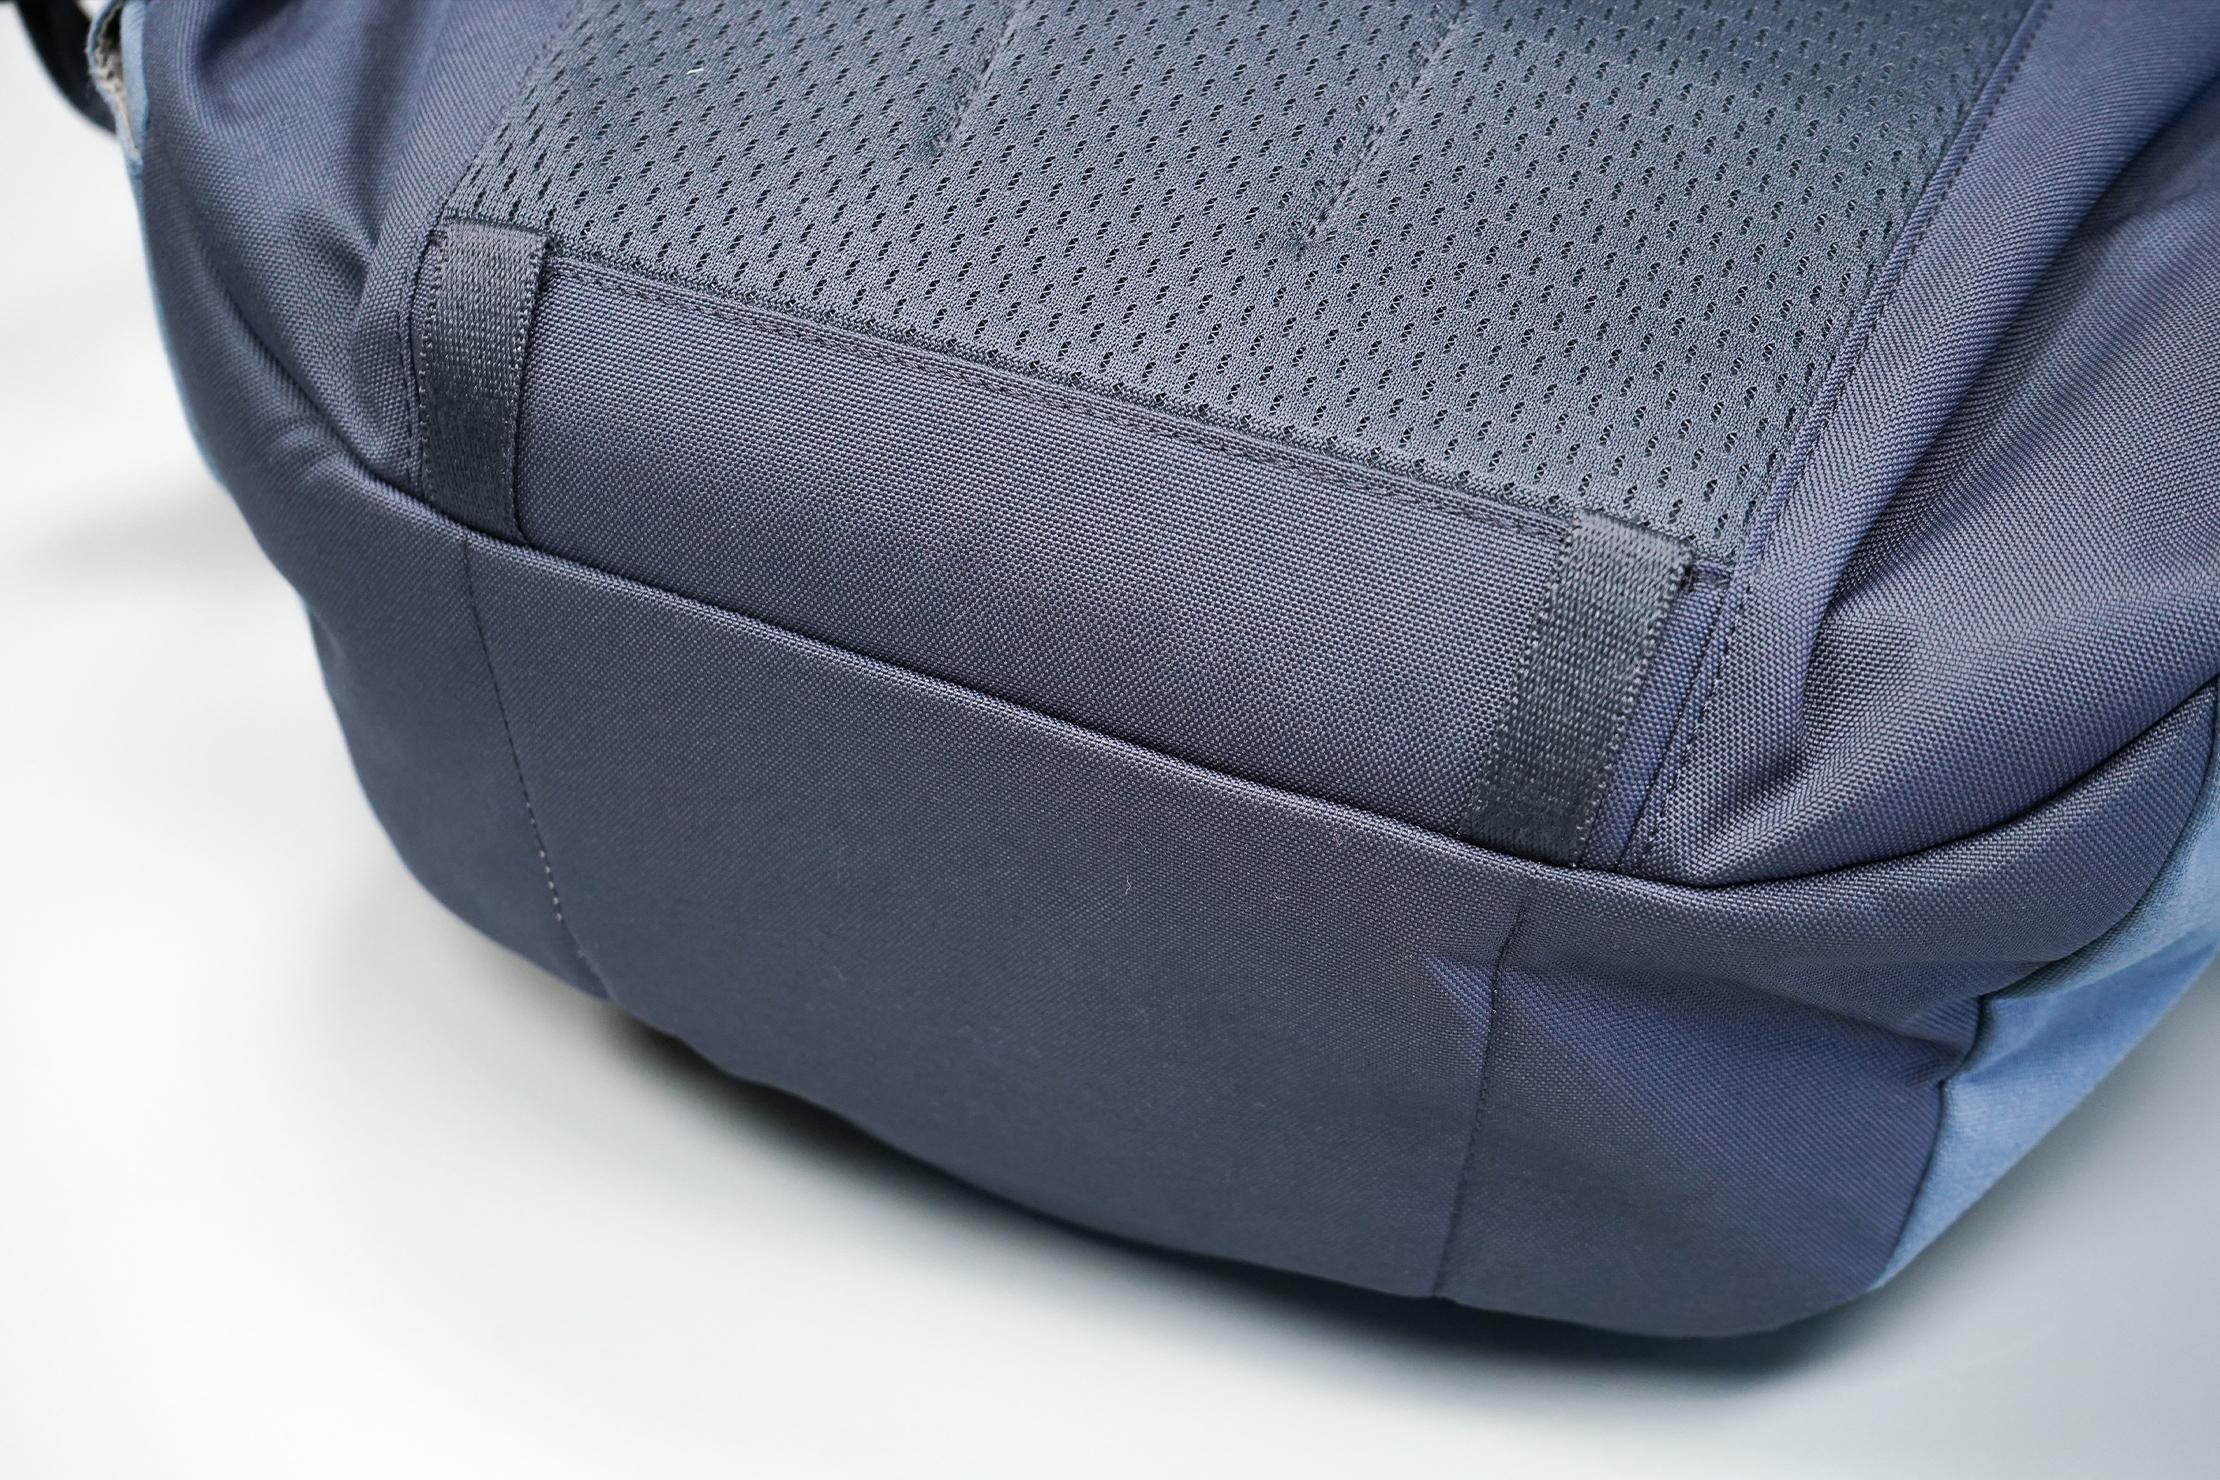 Boundary Supply Rennen Recycled Daypack | Bottom lash points